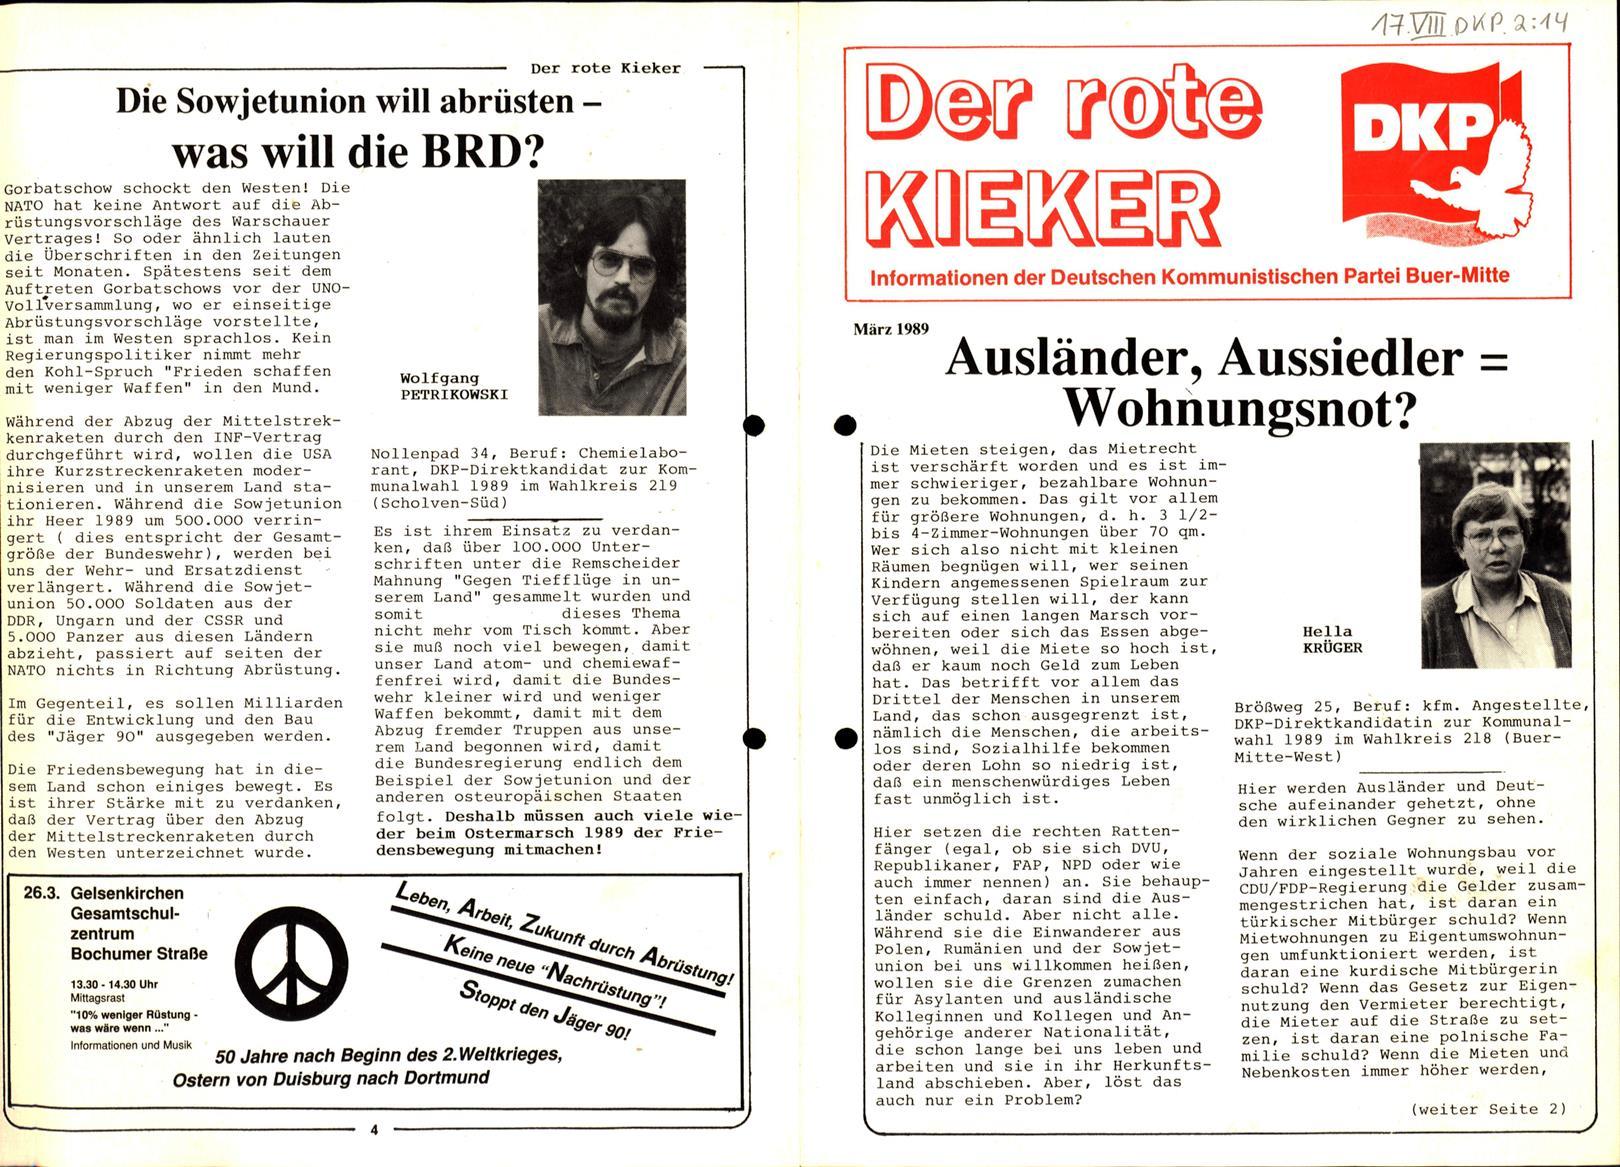 Gelsenkirchen_DKP_Der_rote_Kieker_19890300_01